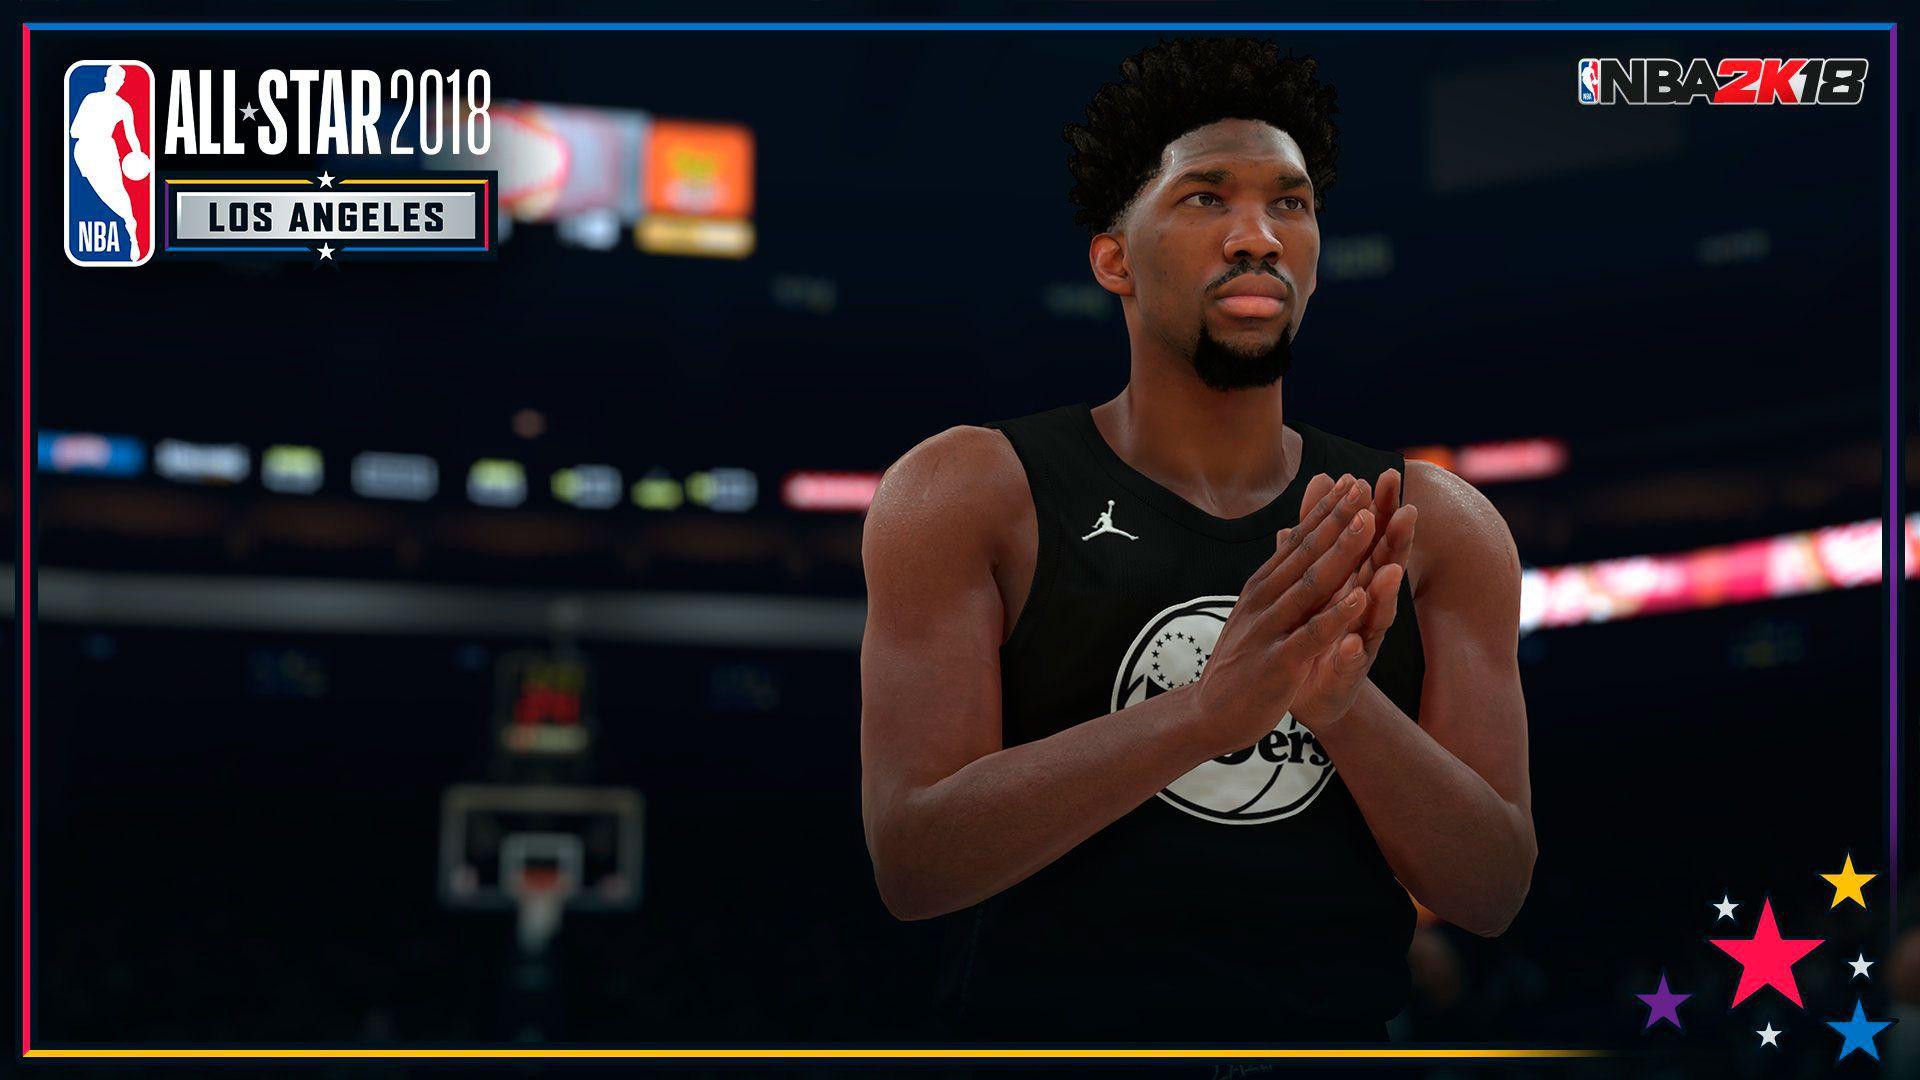 NBA 2K18 All-Star